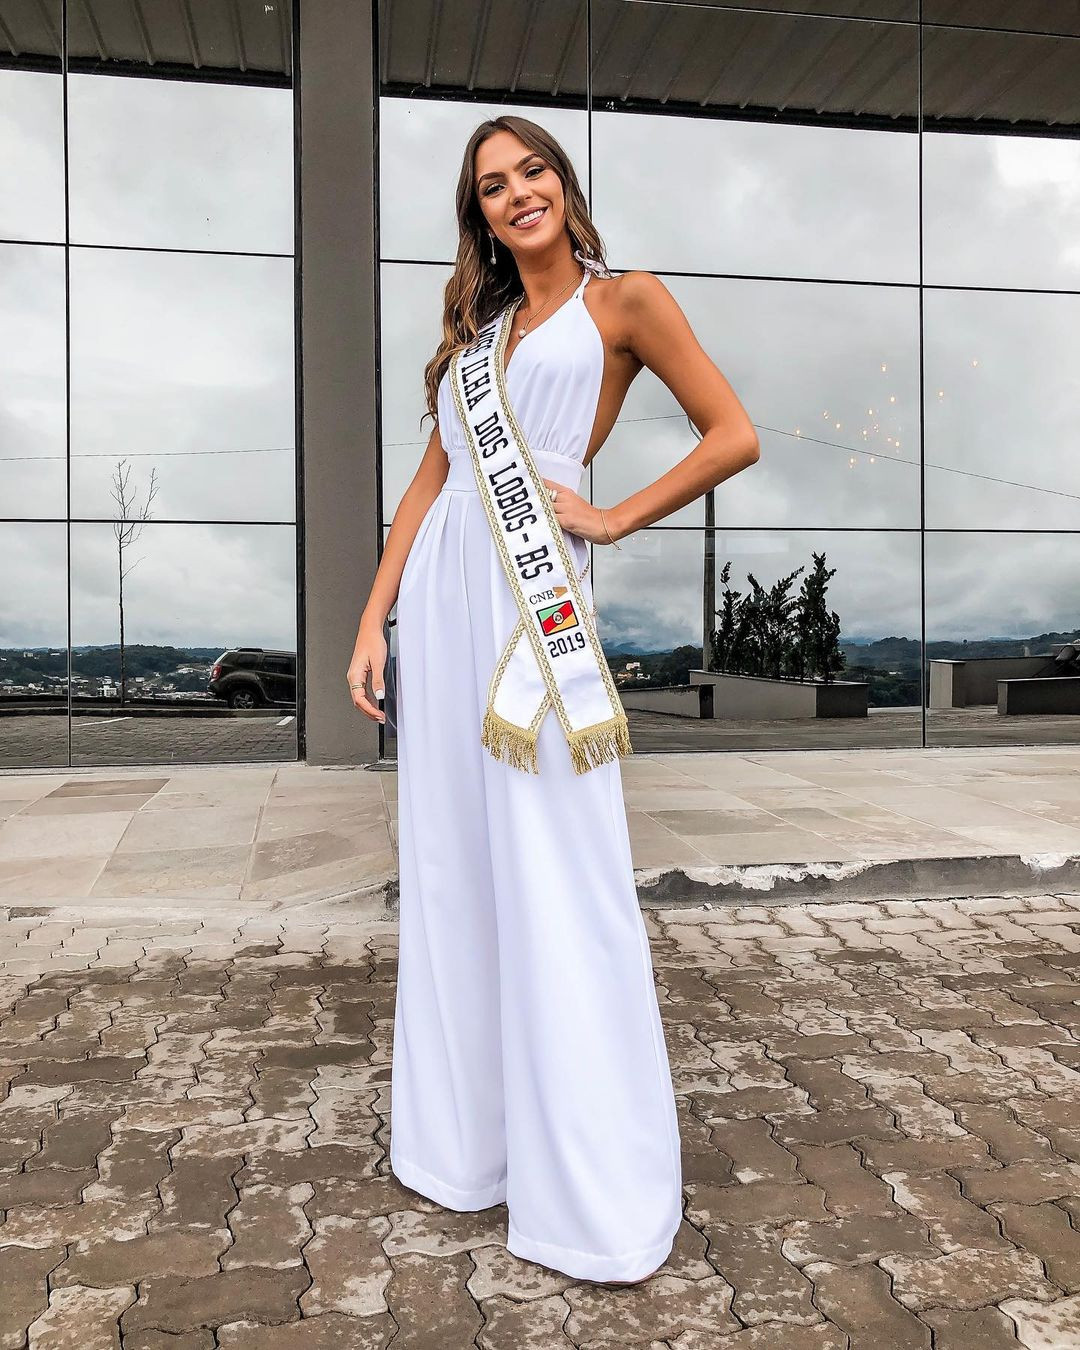 ana flavia giacomini, miss ilha dos lobos mundo 2019. - Página 7 Fwxzml10